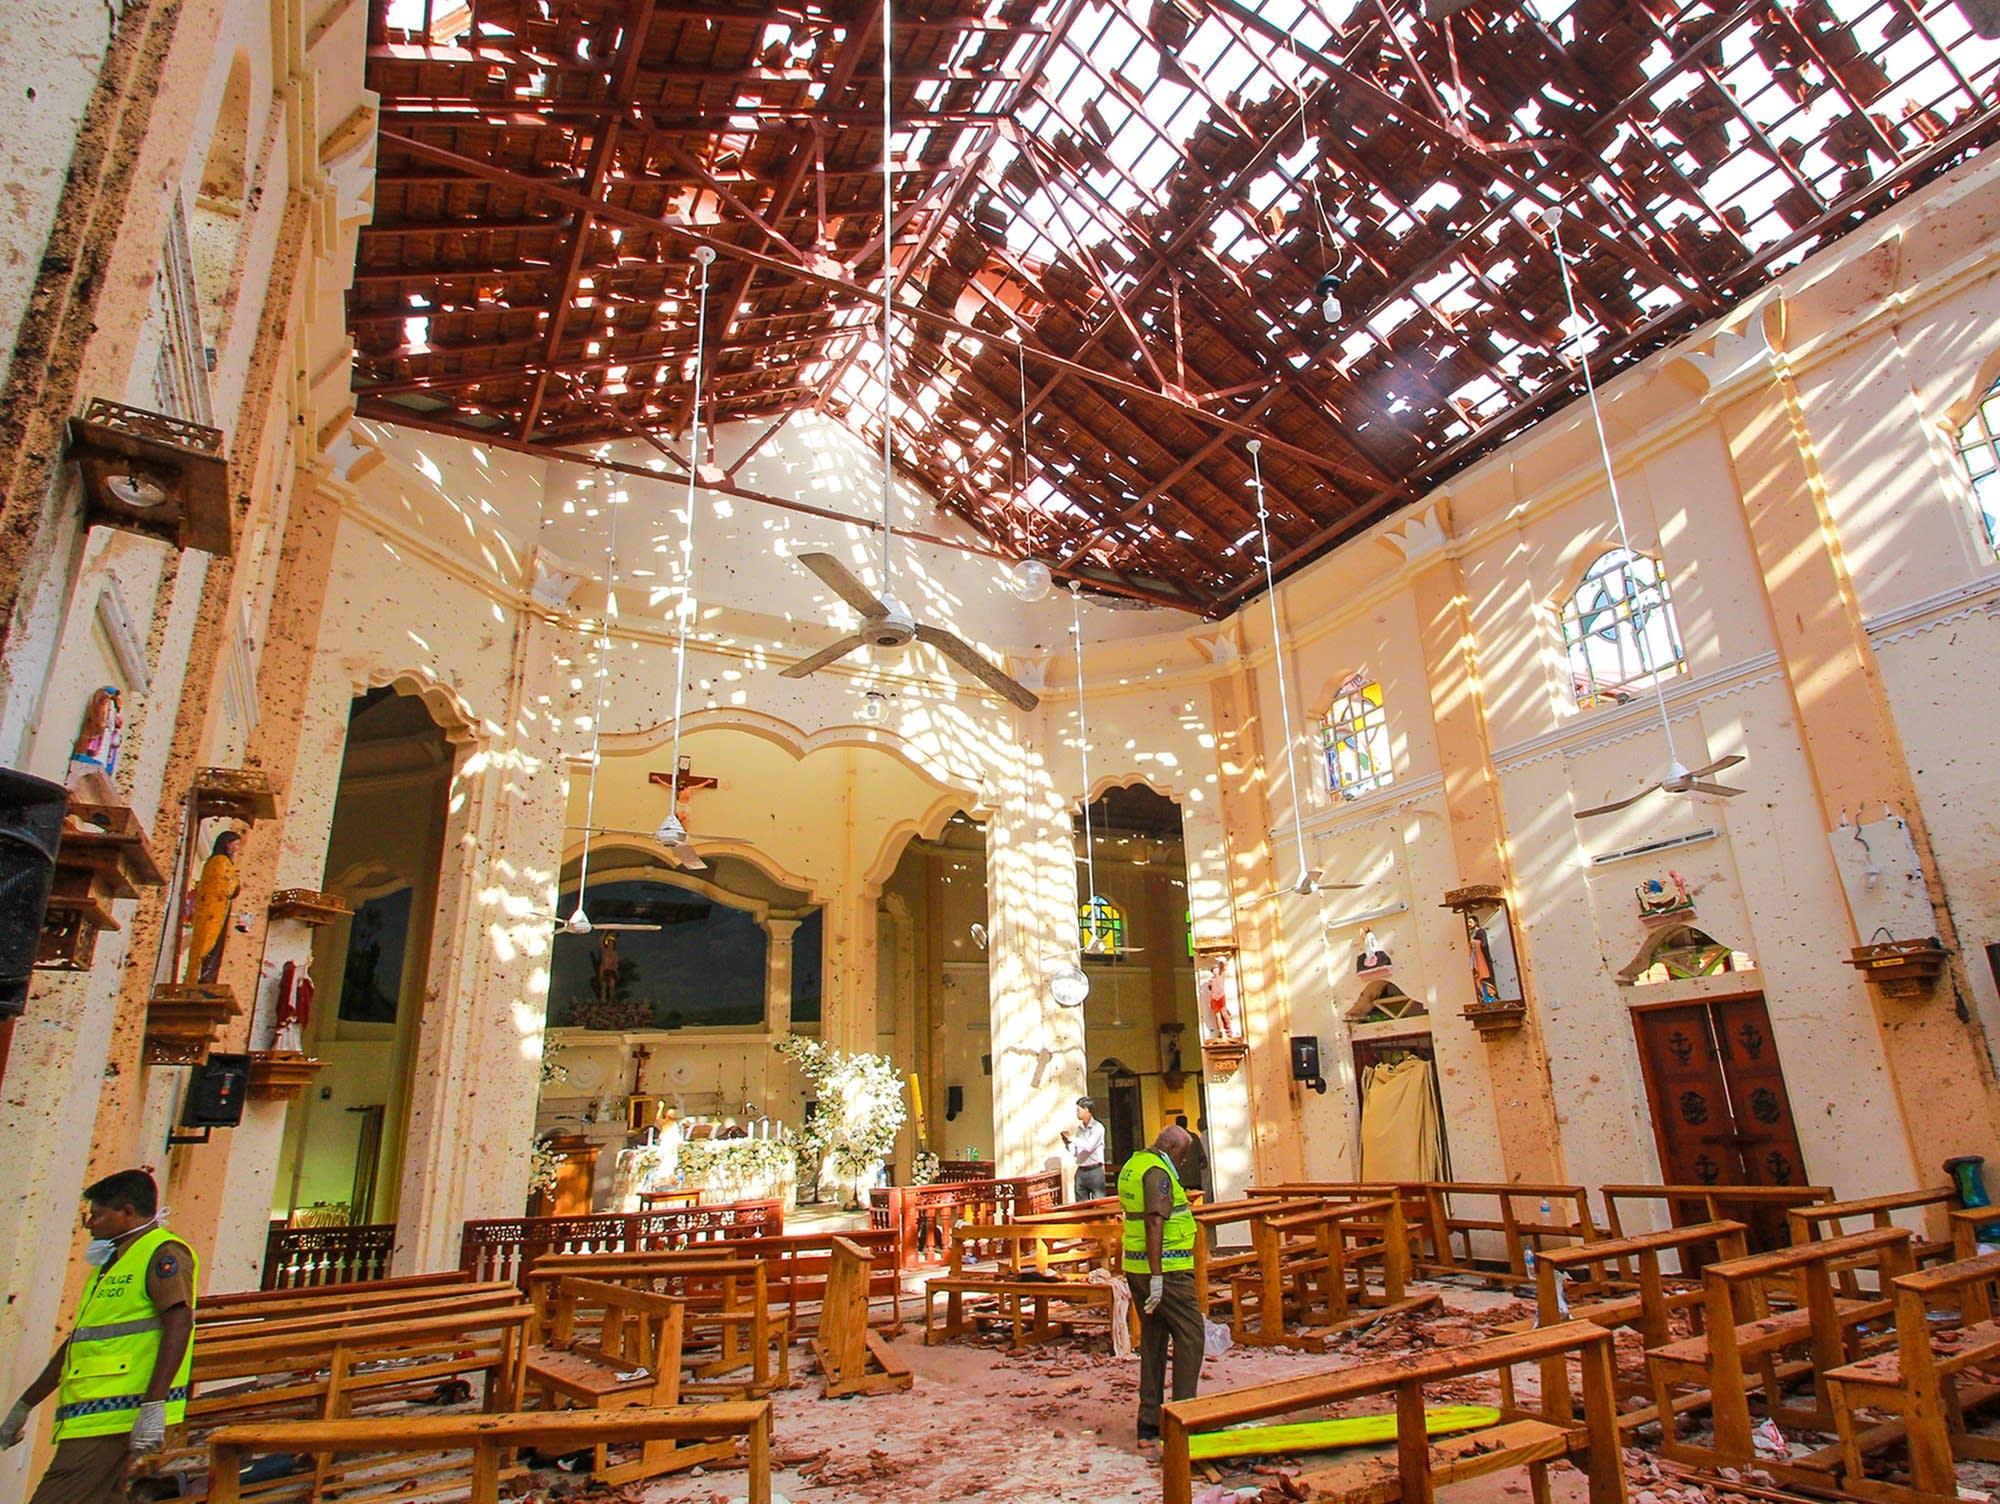 Sri Lankan officials inspect the damaged St. Sebastian's Church